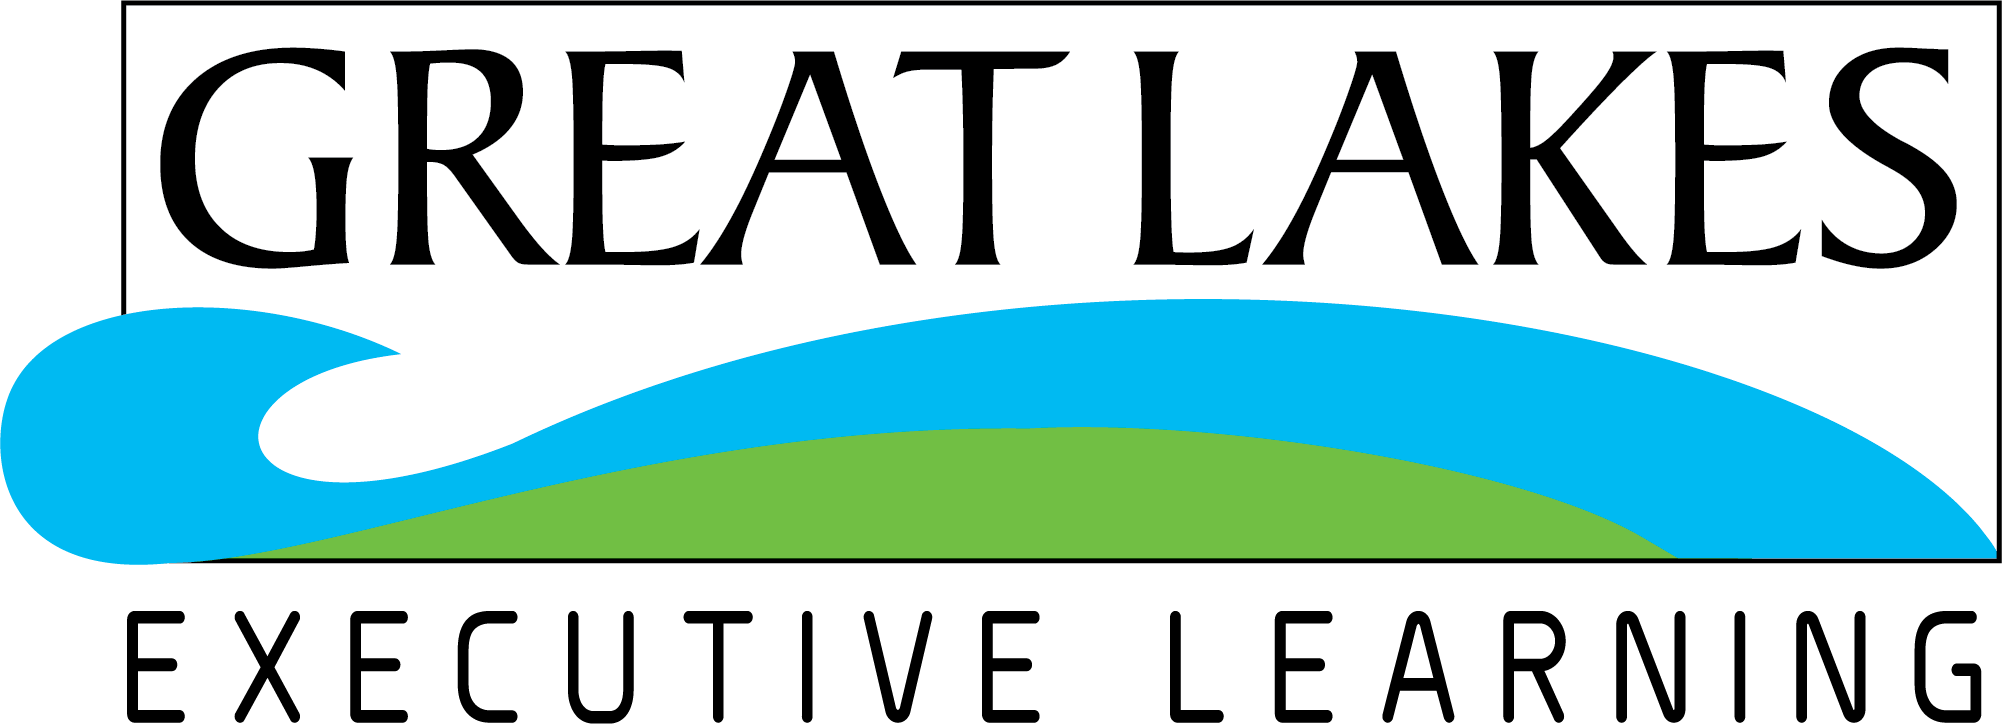 Great Lakes Executive